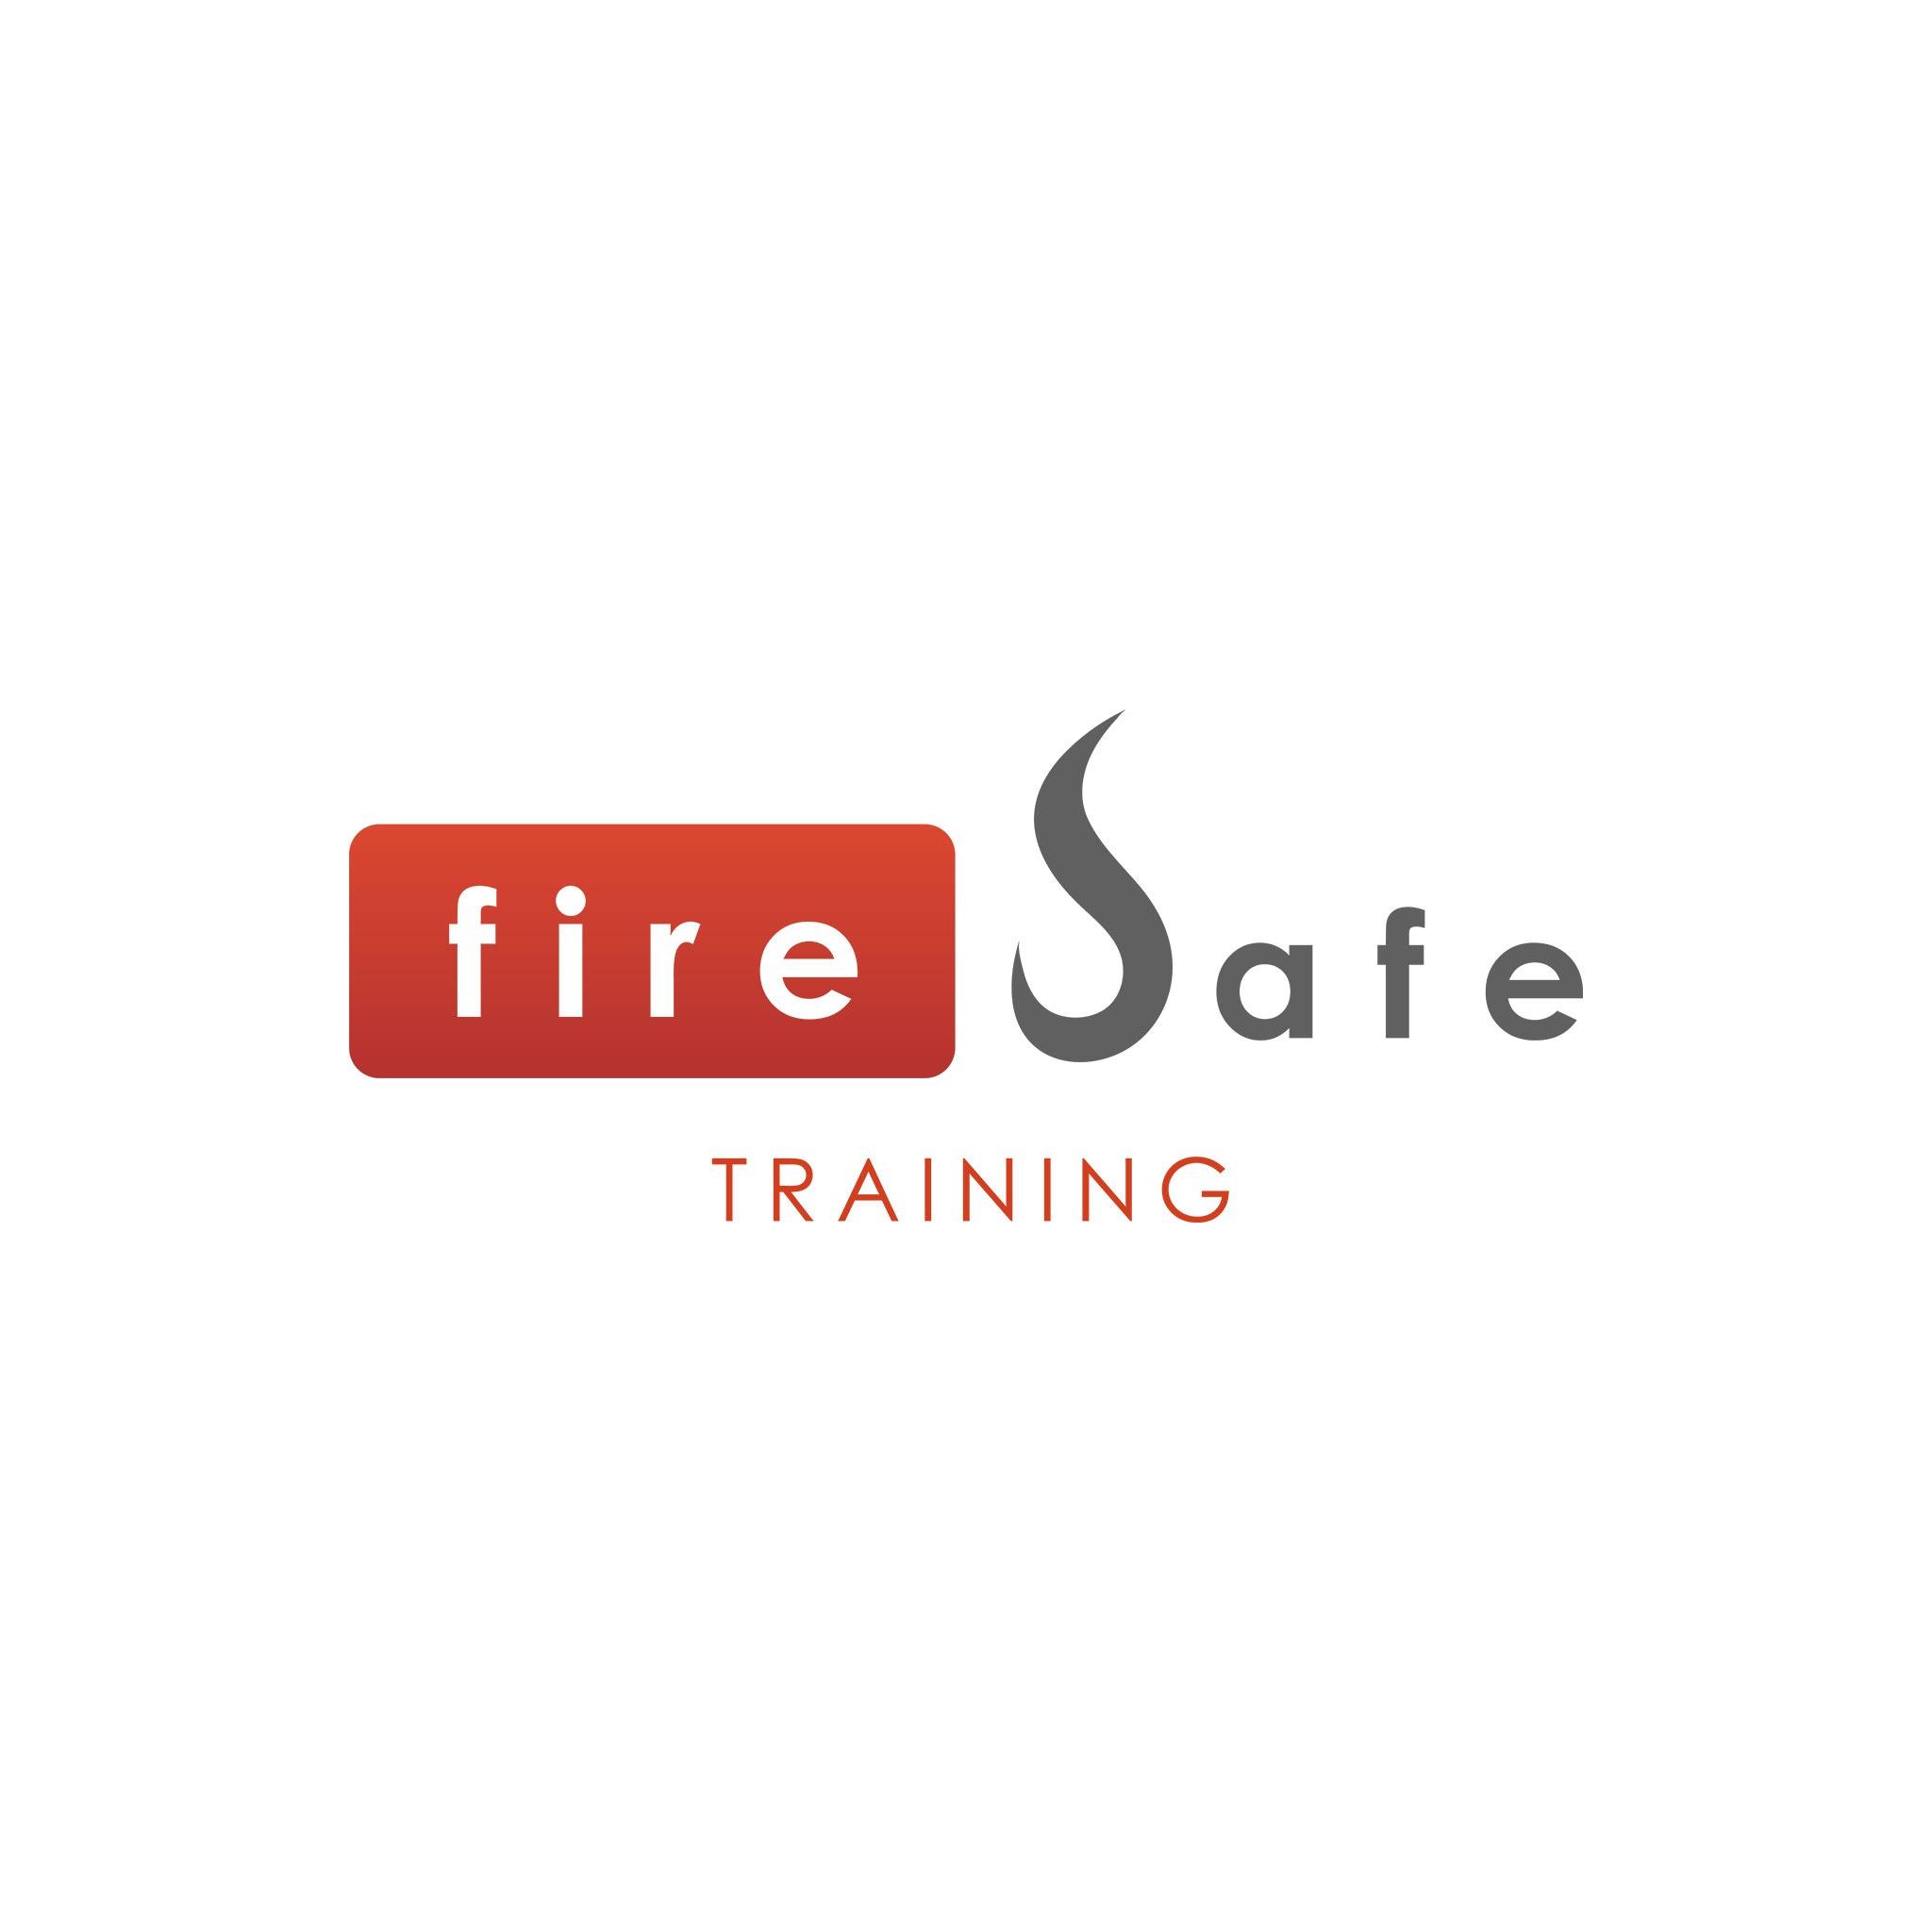 FireSafe Training Logo